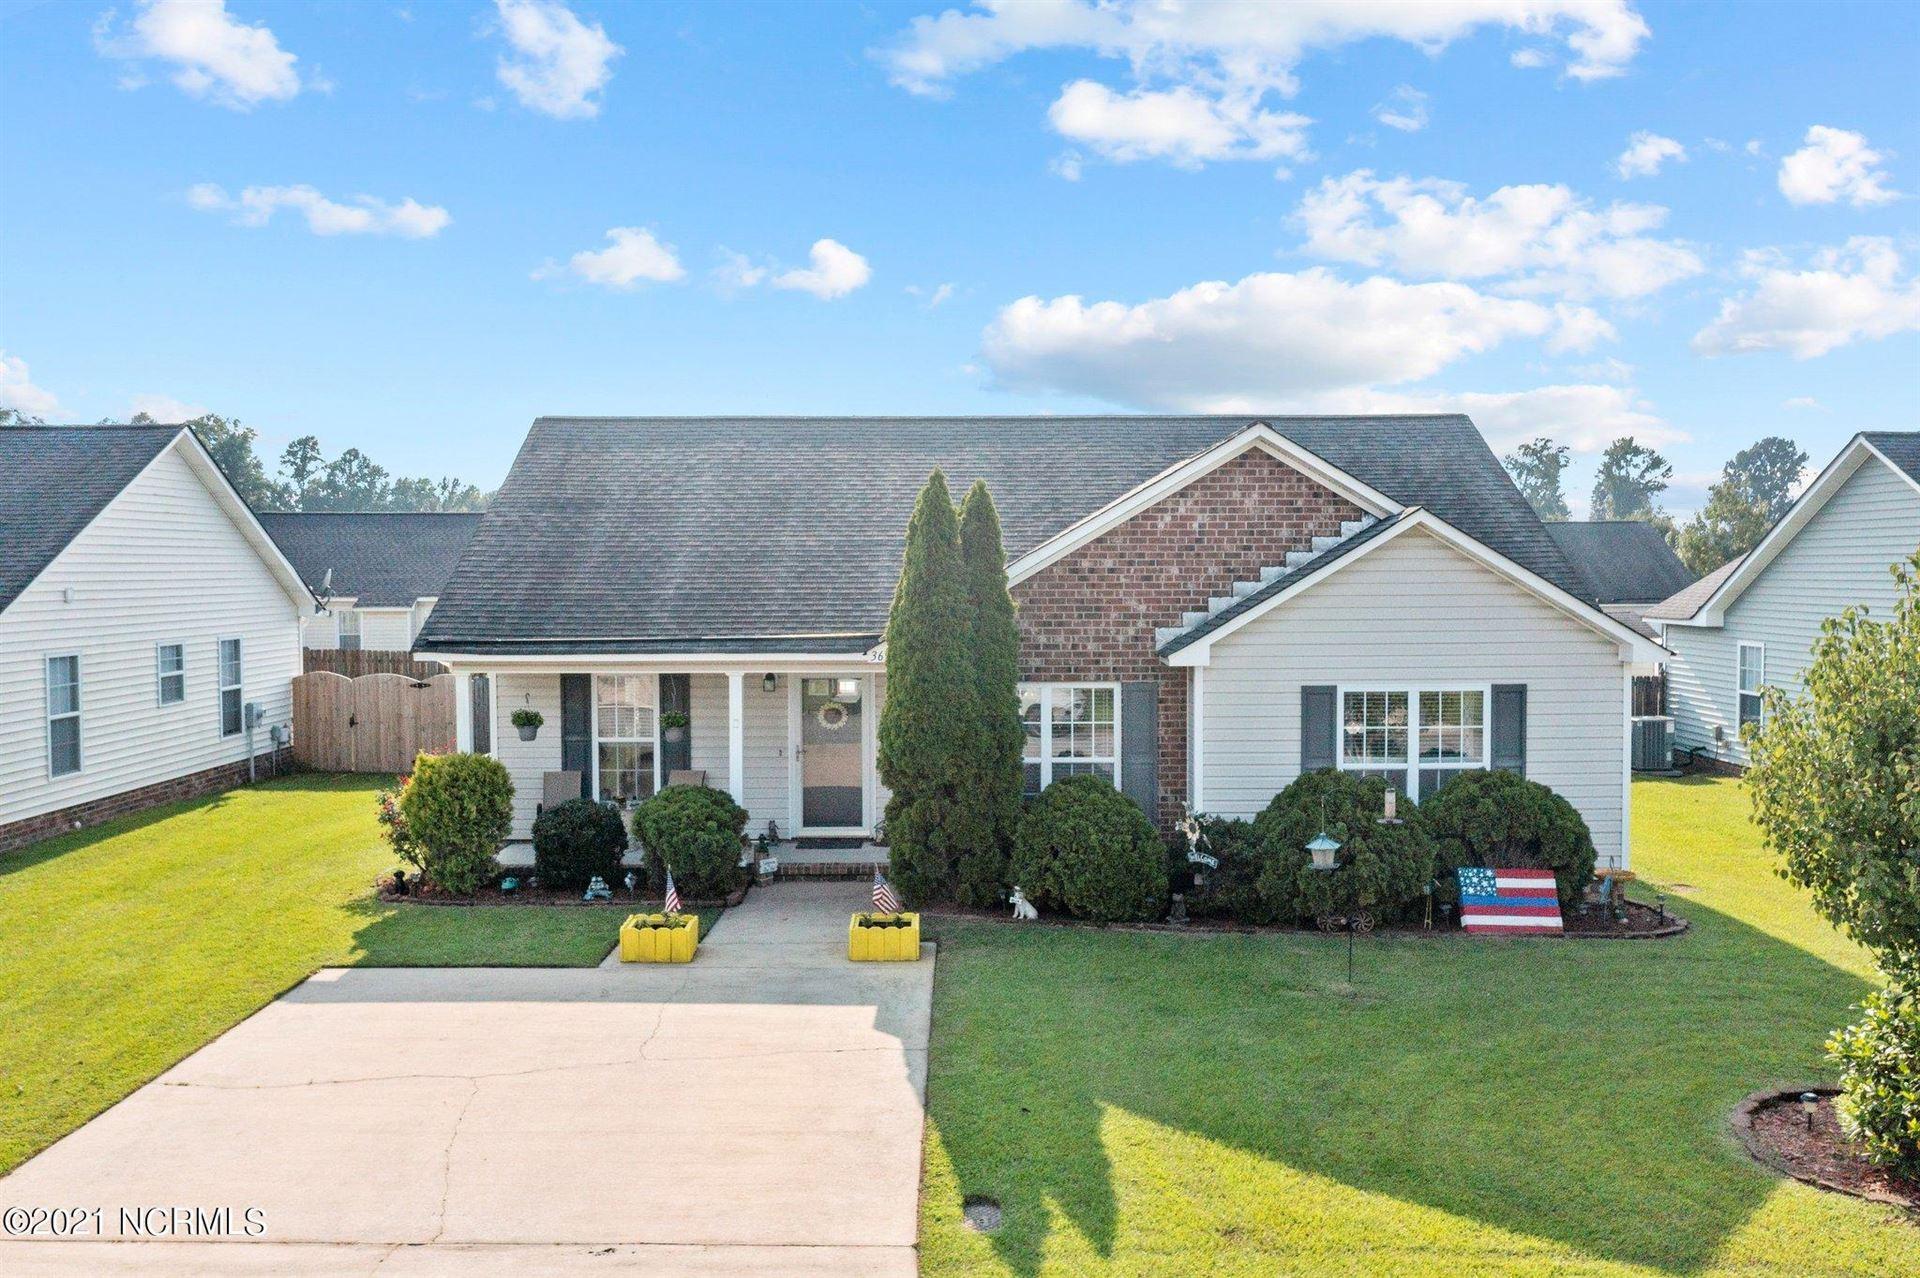 Photo of 3698 Highland Drive, Ayden, NC 28513 (MLS # 100285999)